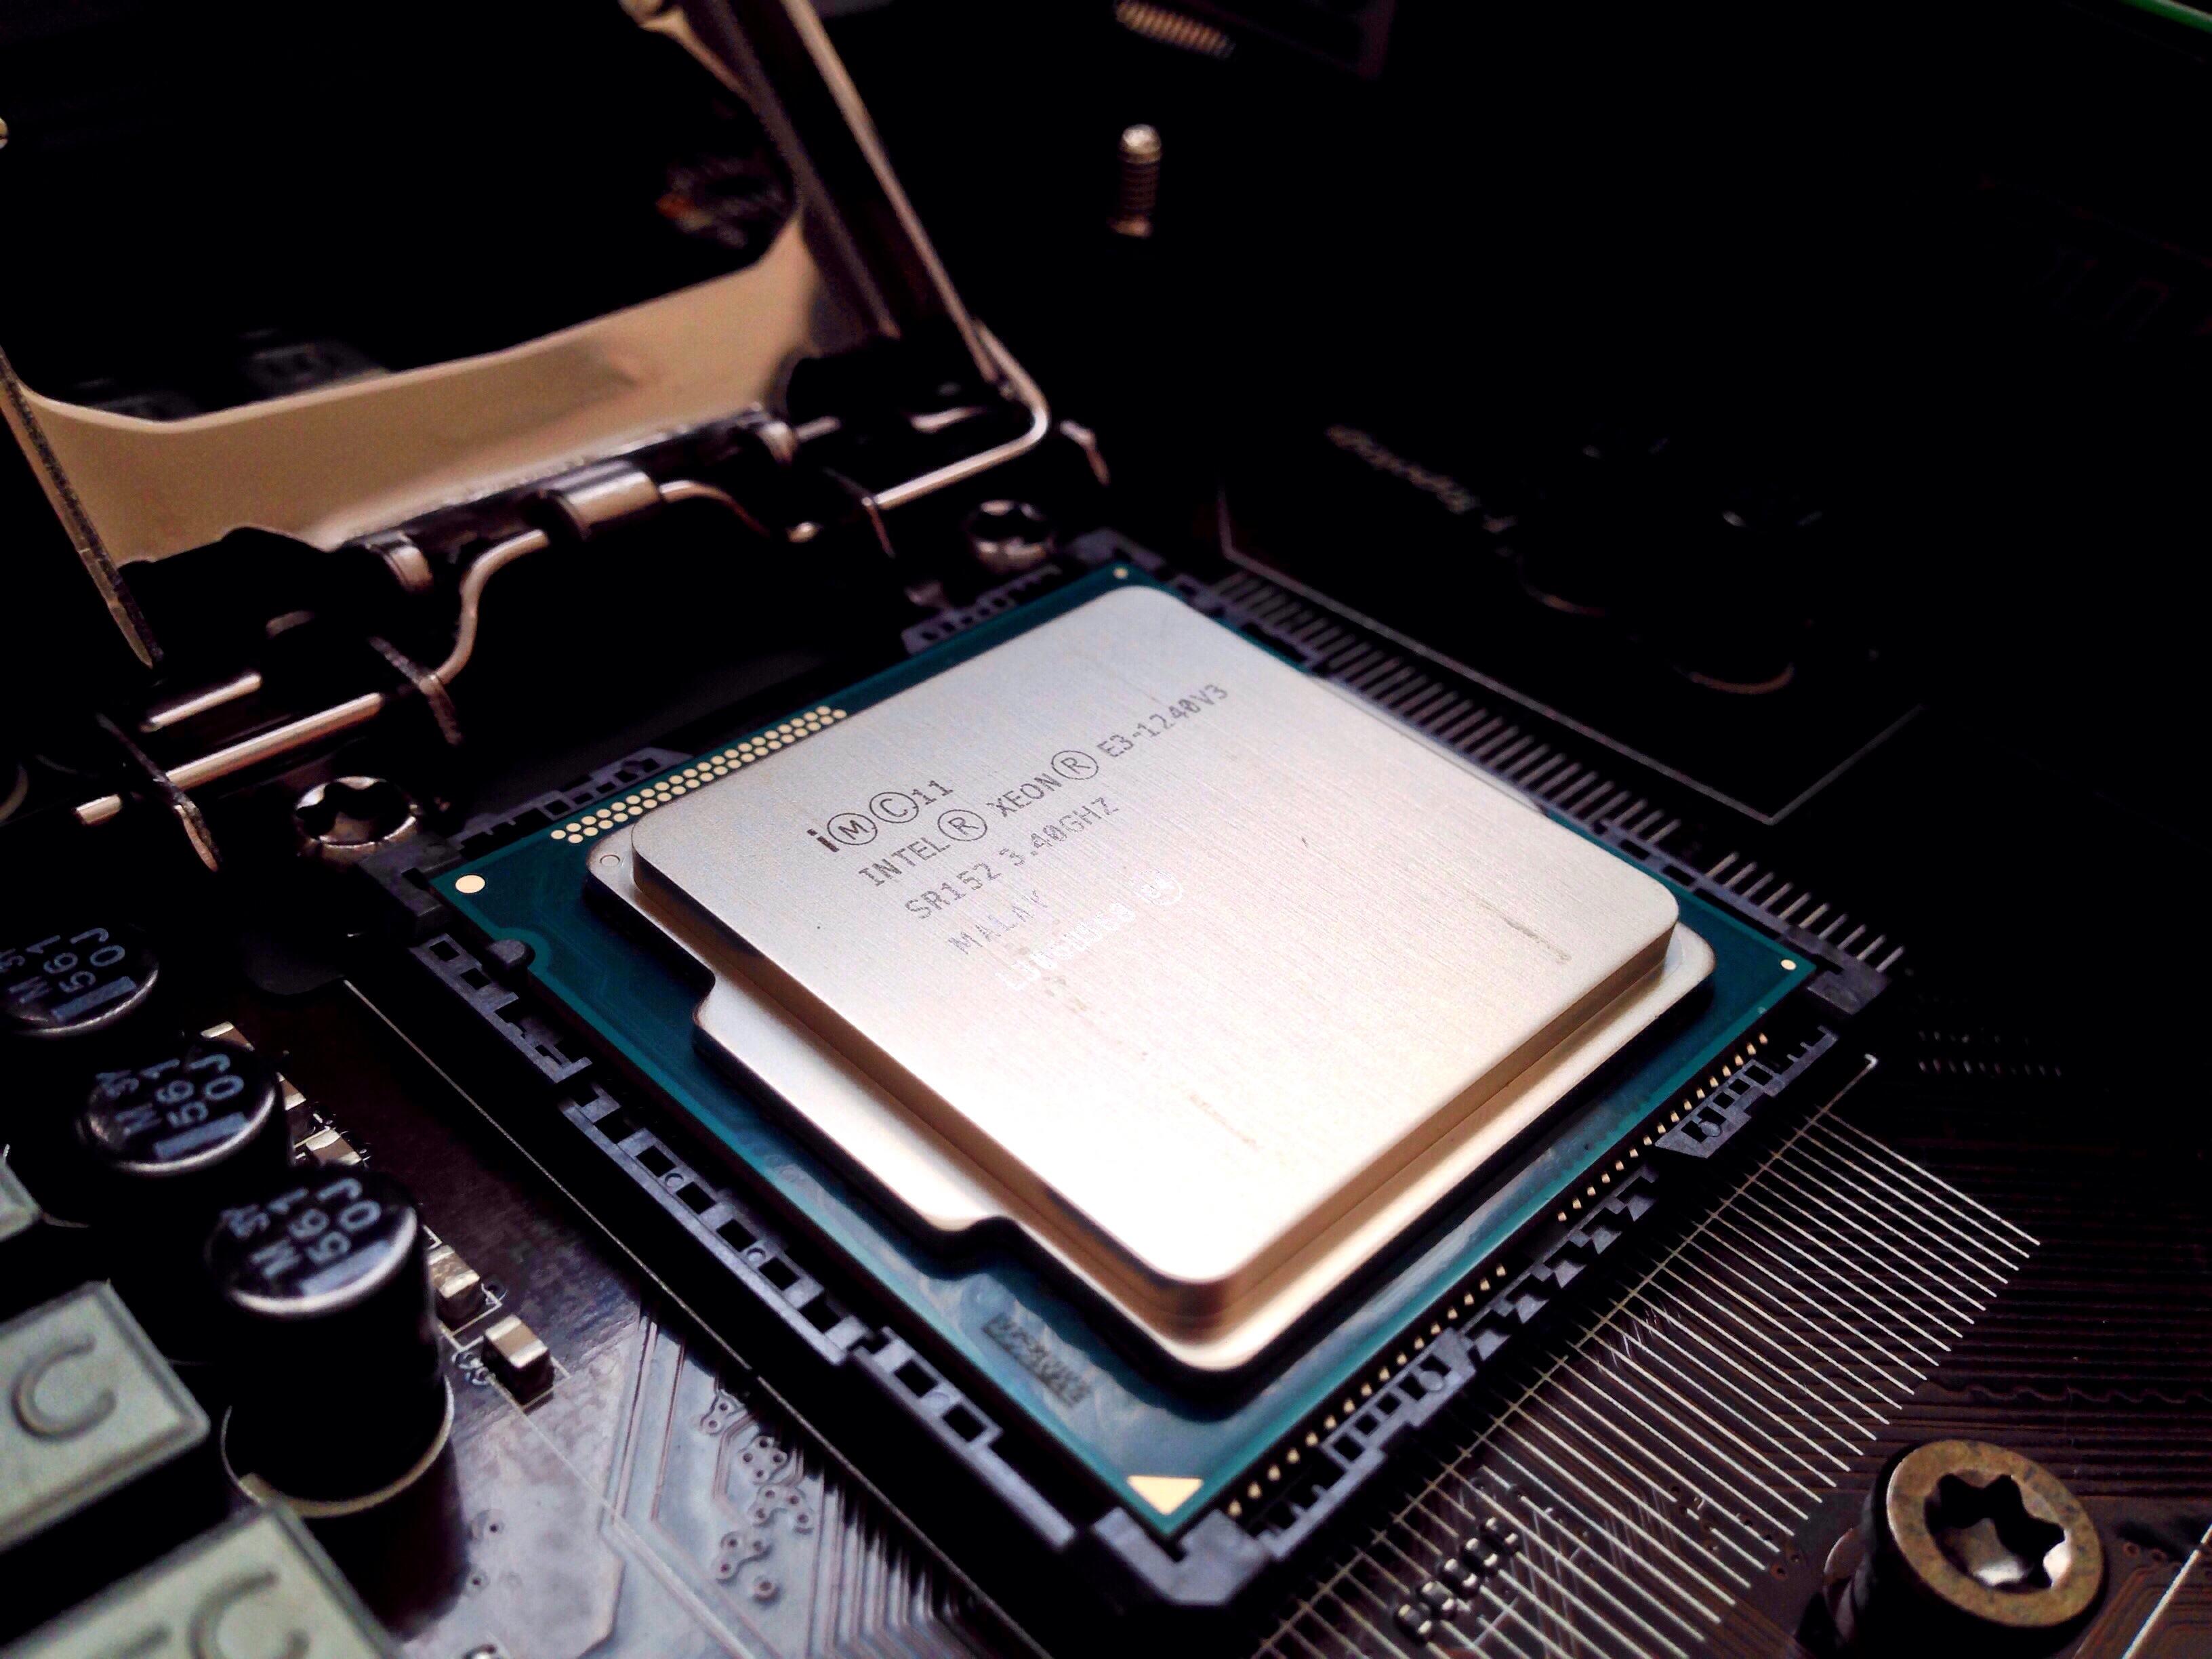 FileIntel Xeon E3 1240V3 Haswell 340GHzjpg   Wikimedia Commons 3264x2448